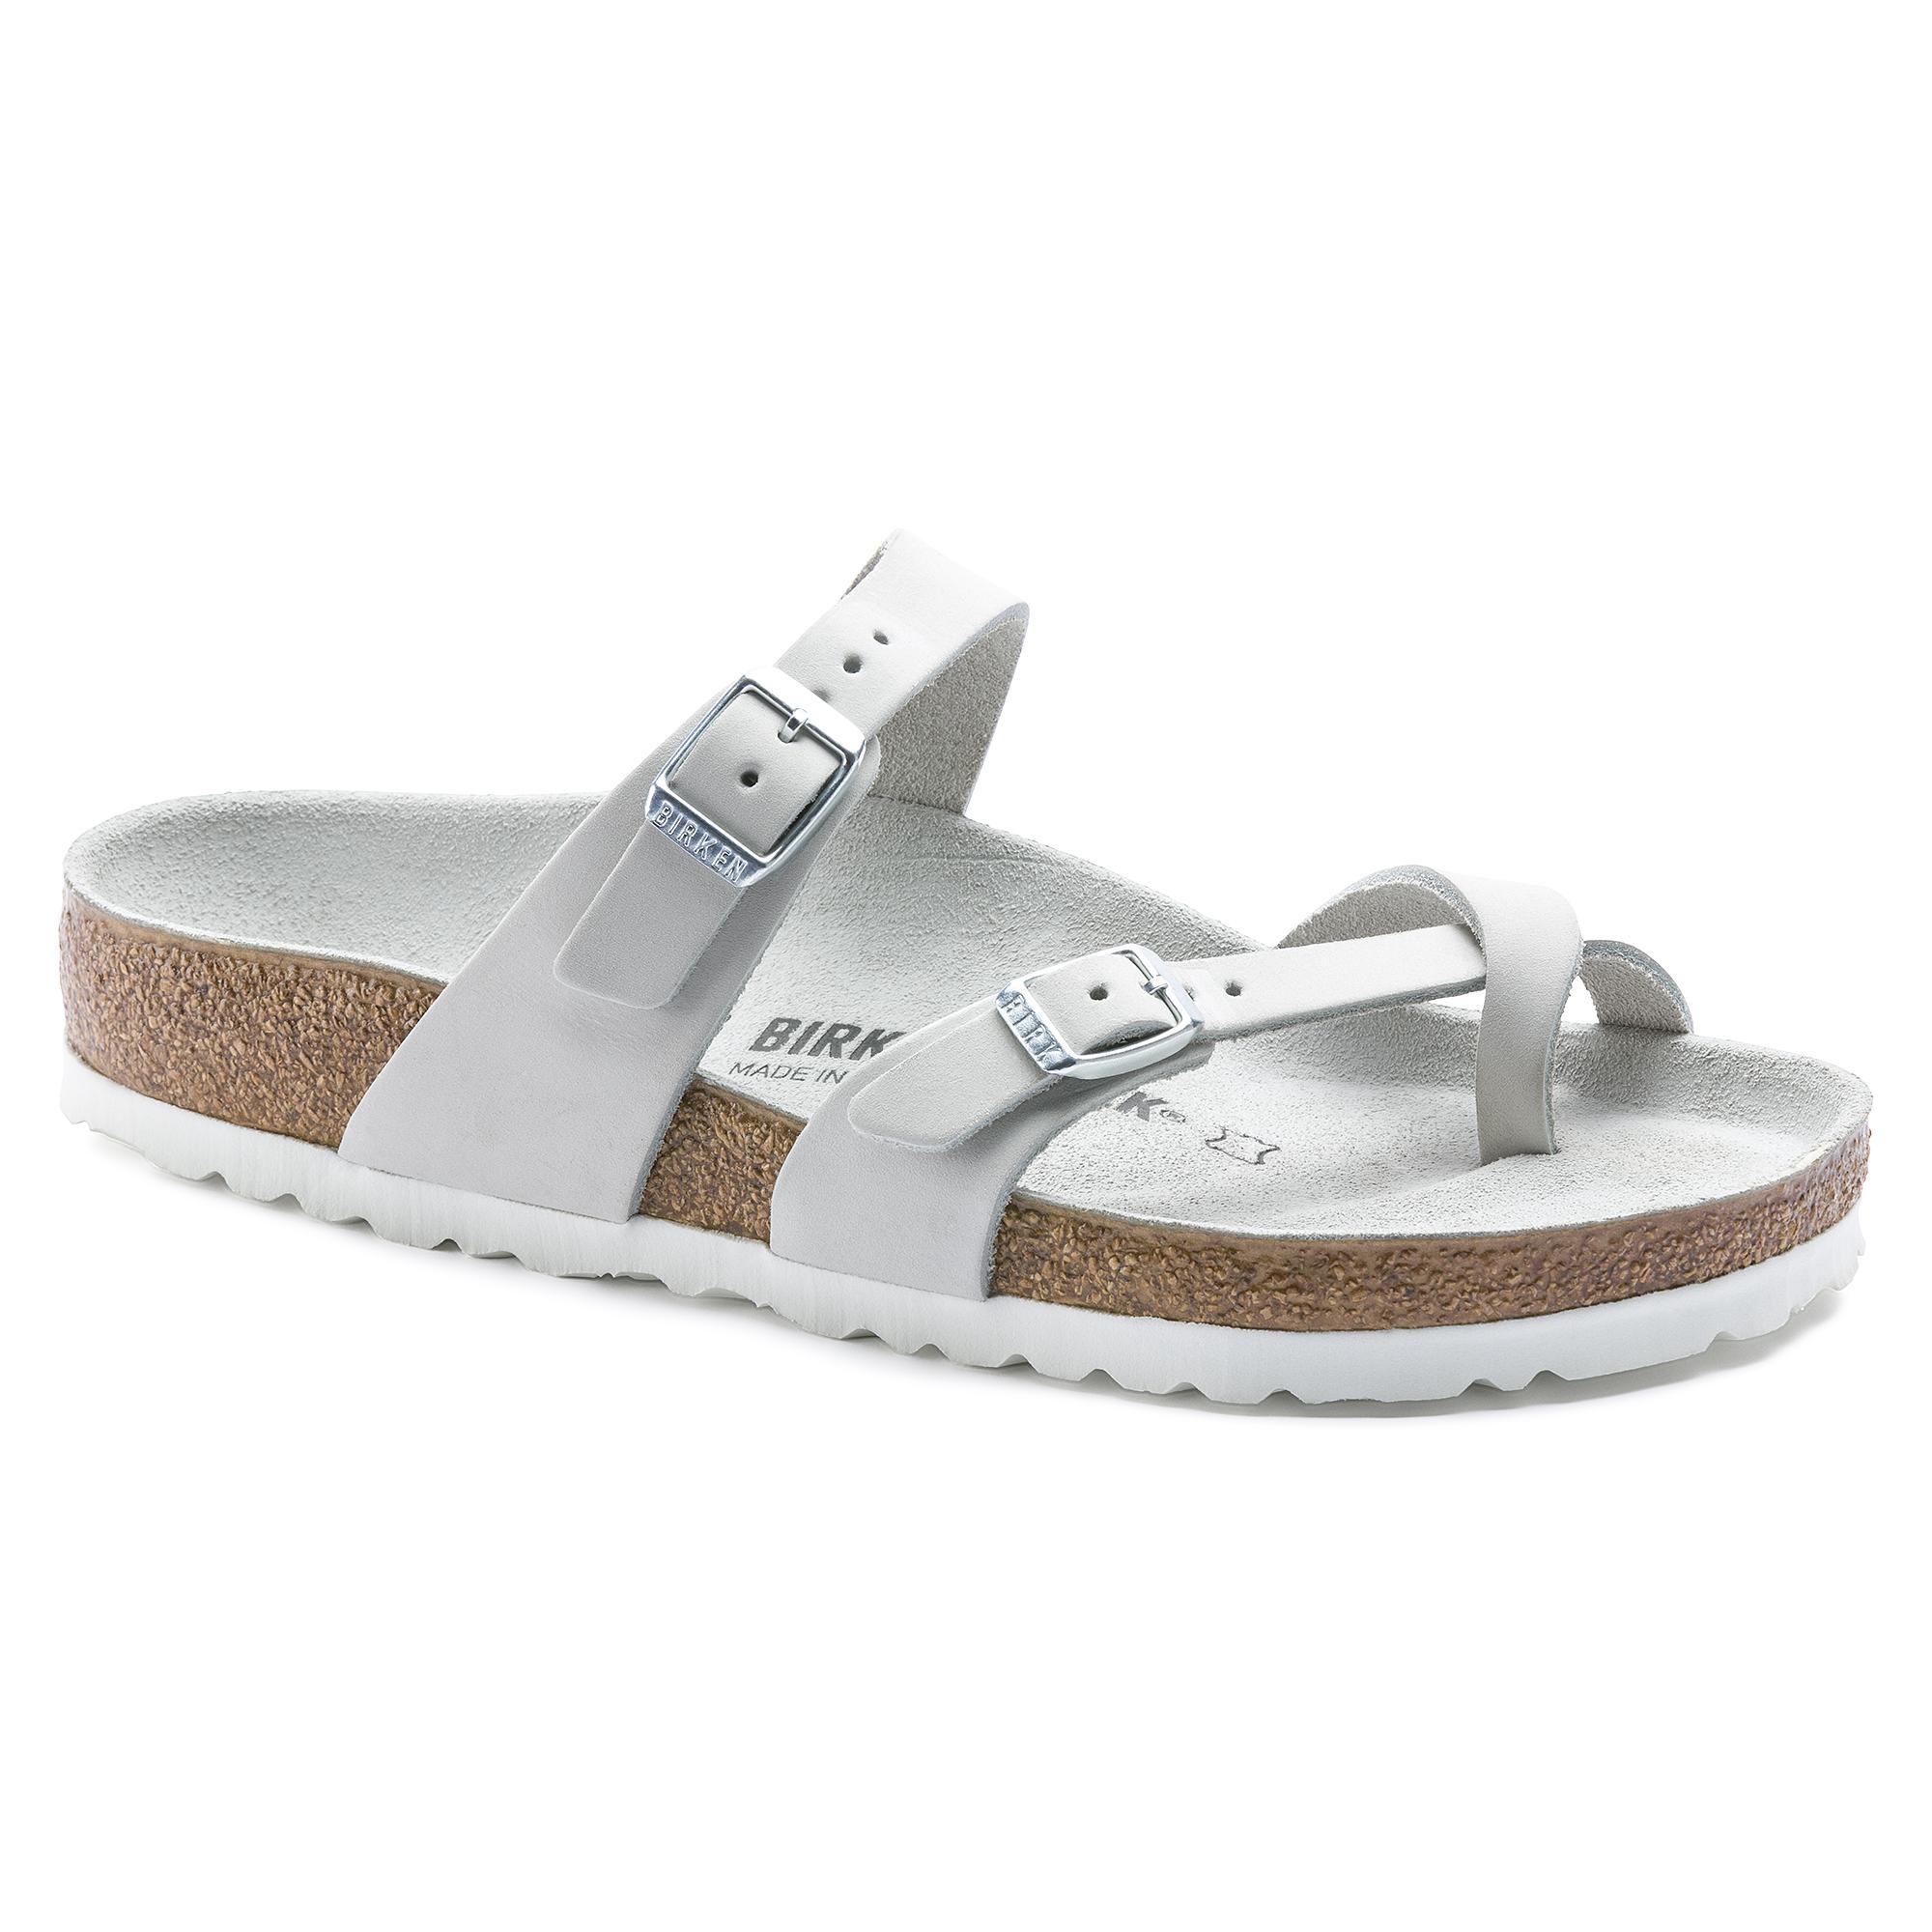 405c7a4a0 Mayari Nubuck Leather White | shop online at BIRKENSTOCK